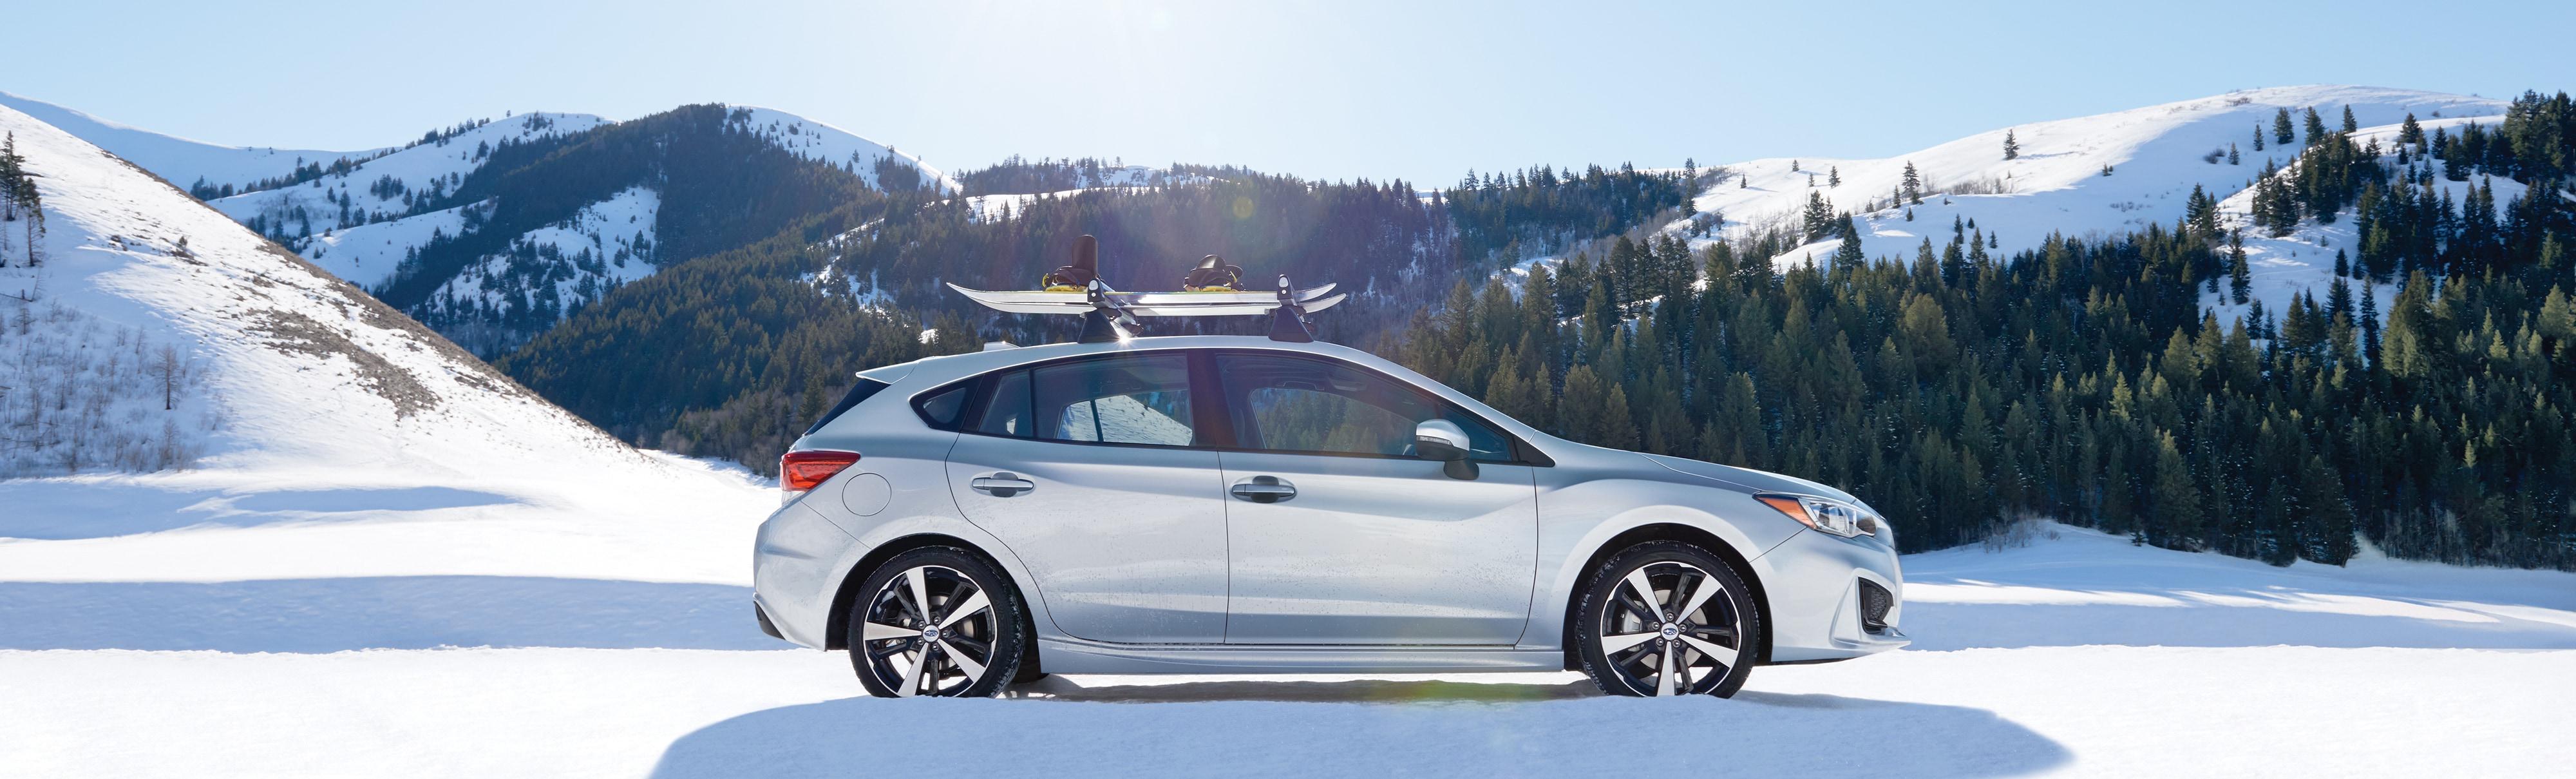 New Subaru Impreza For Sale in Keene, NH | Subaru of Keene